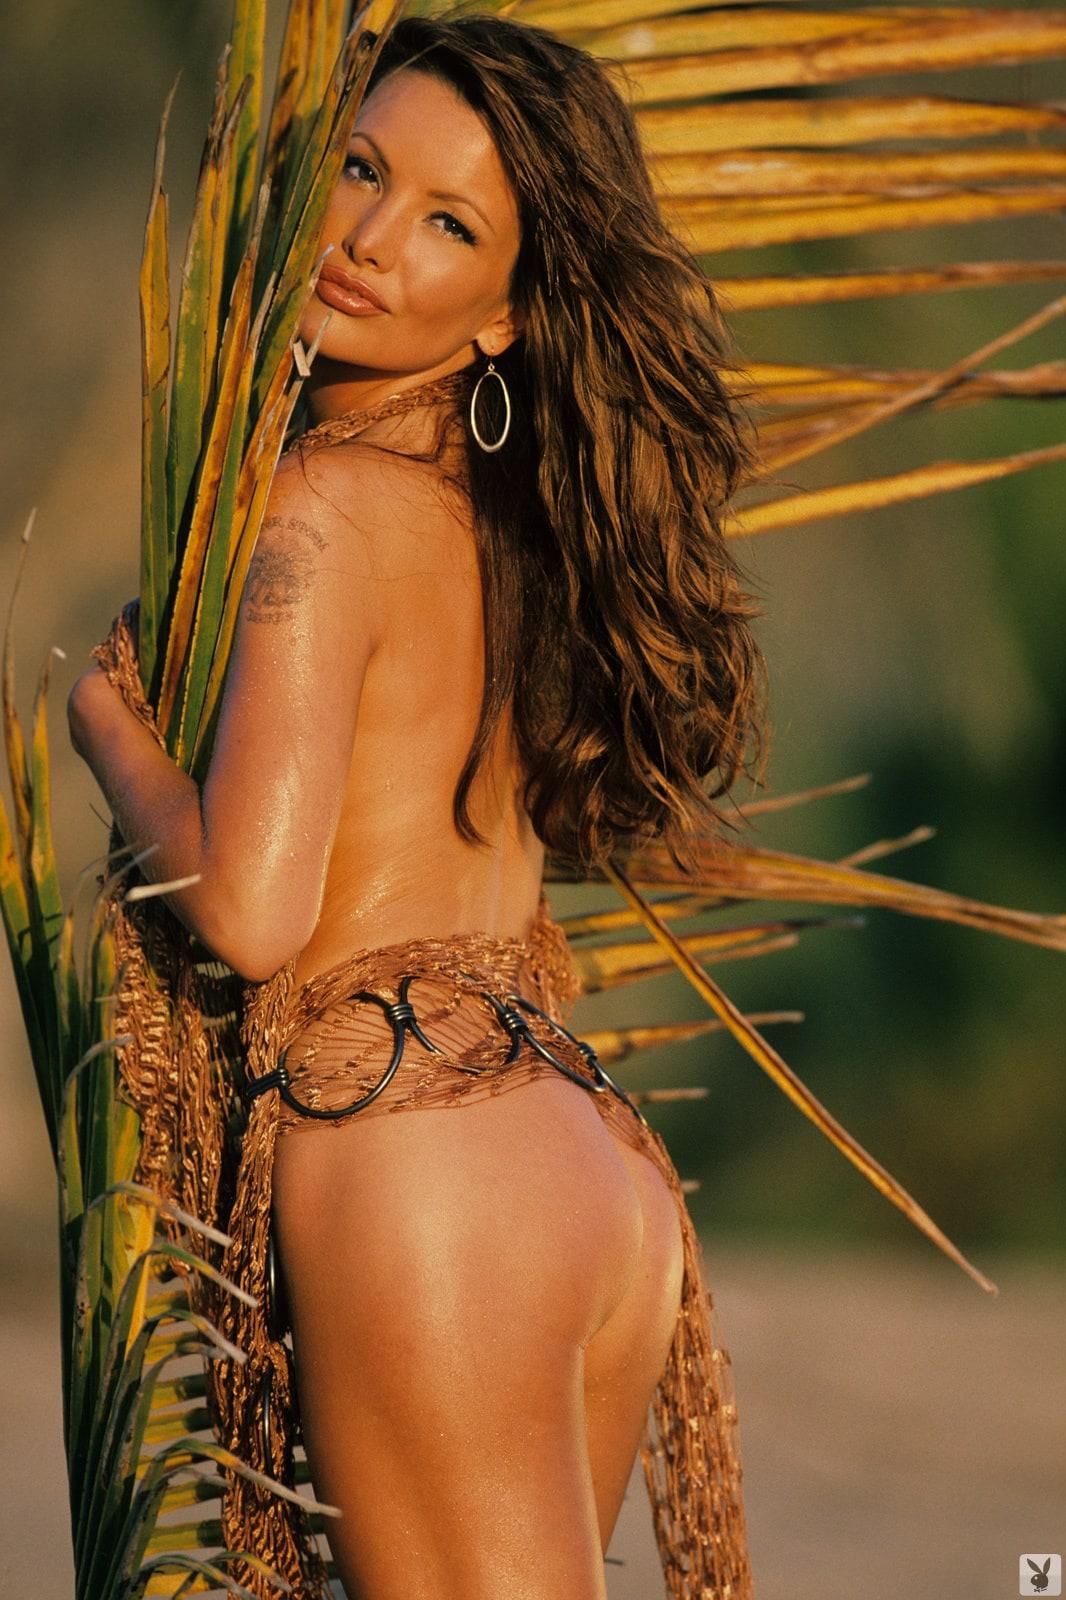 chennai call girl in nude